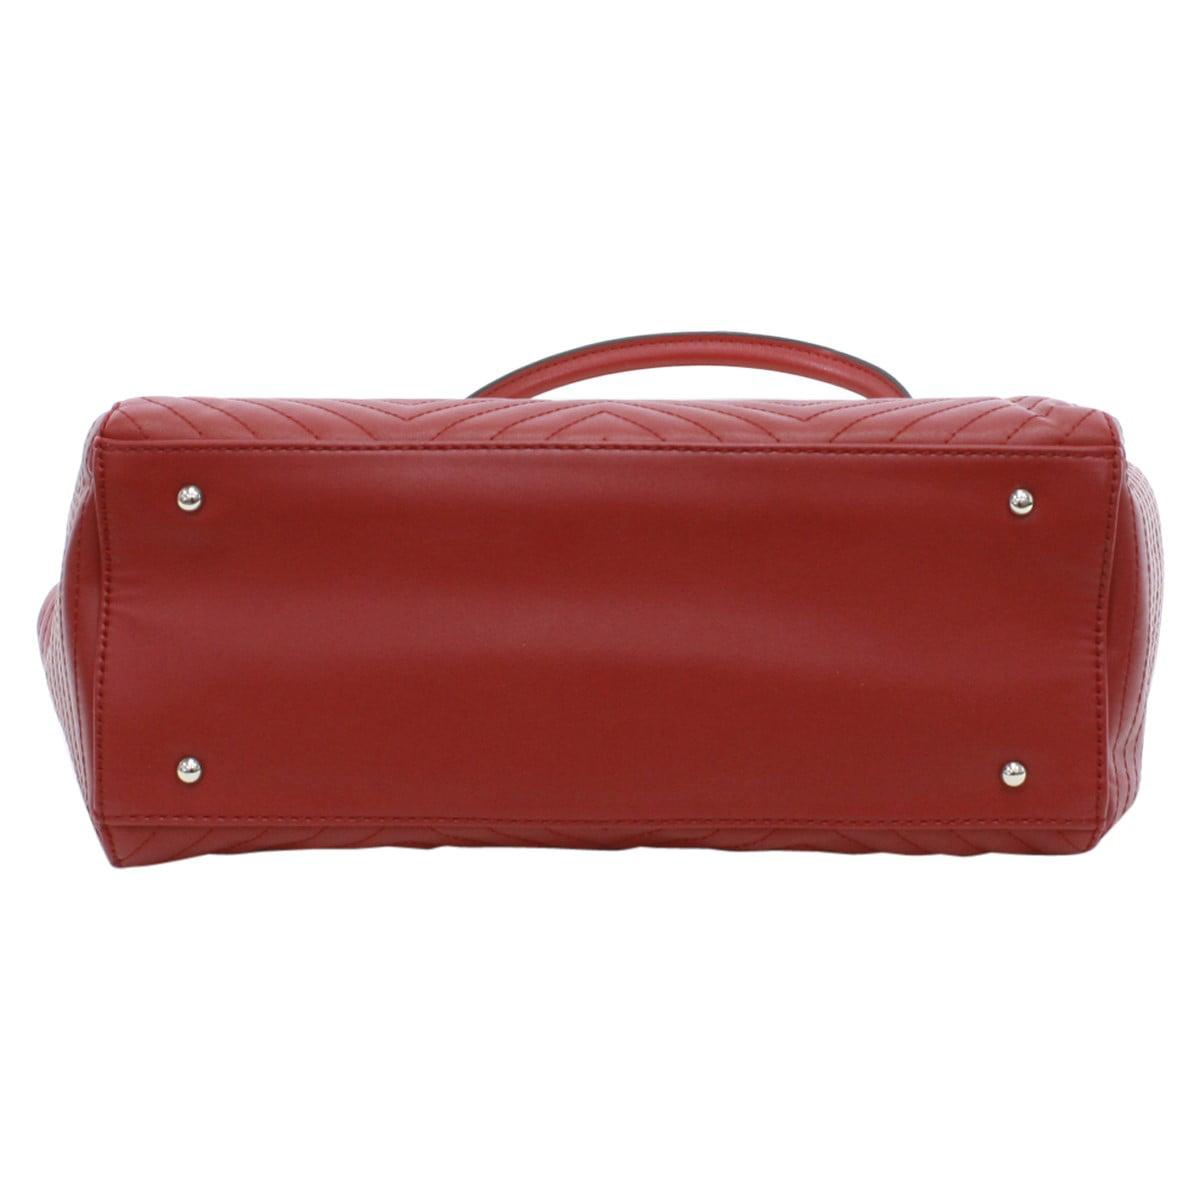 GUESS - Guess Women s Rebel Roma Ruby Quilted Satchel Handbag - Walmart.com 30ece64ad2